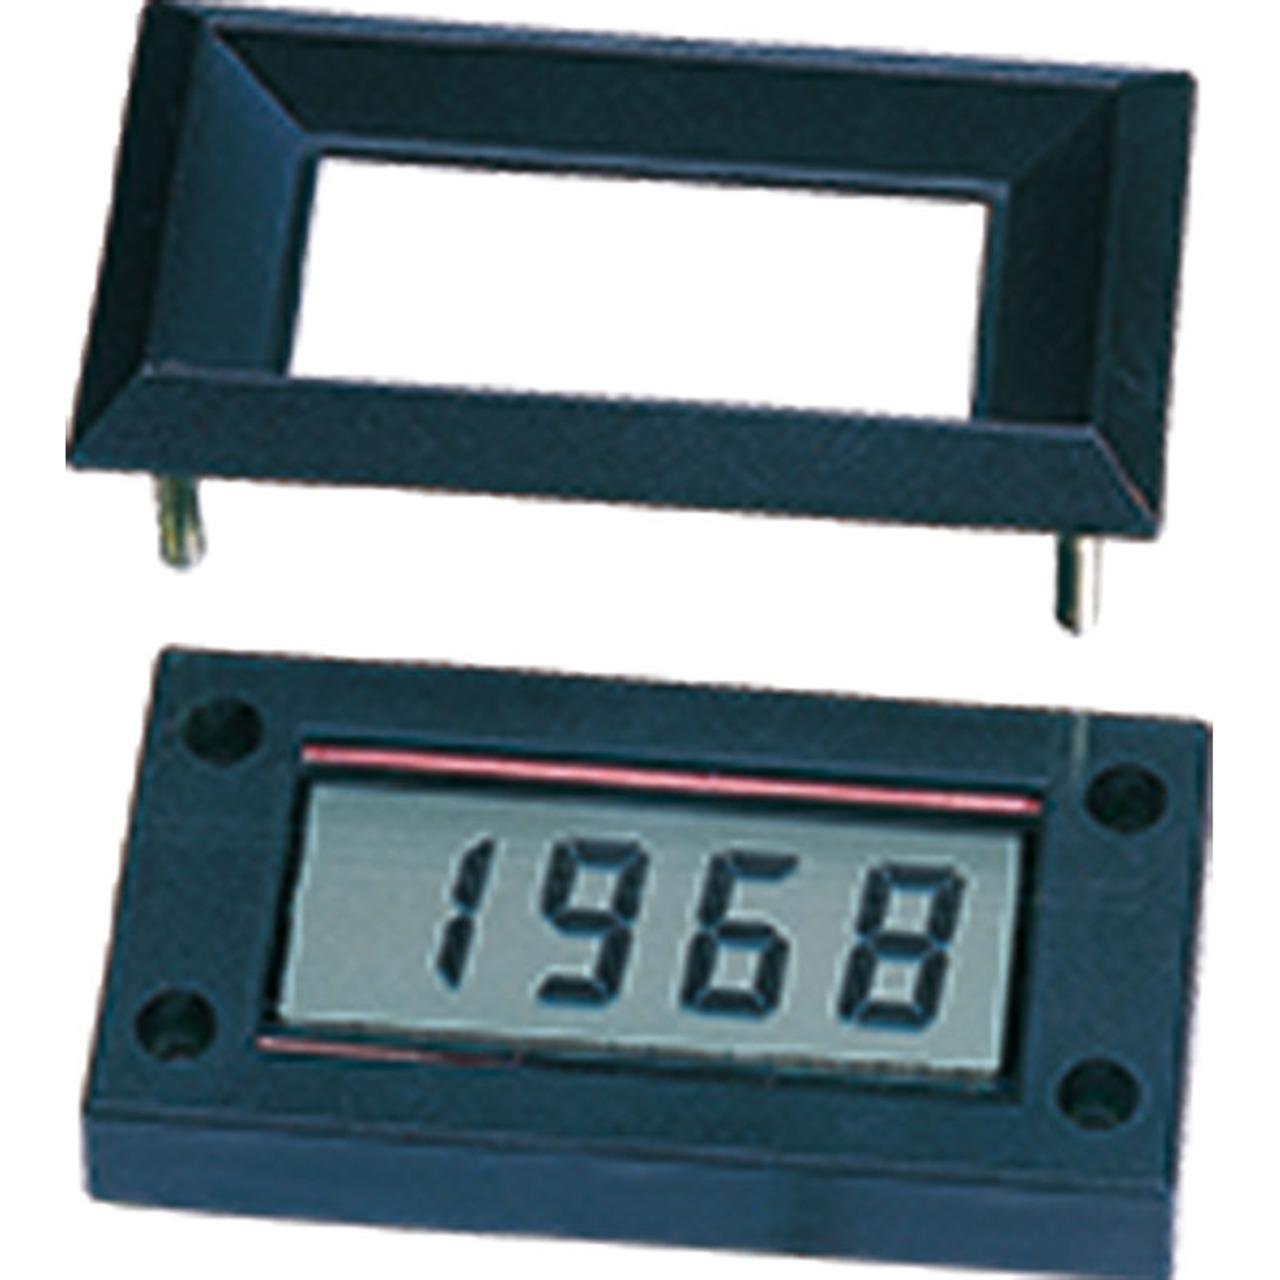 Digitales LCD-Voltmeter - Modul PMB 213A- 3-5-stellig